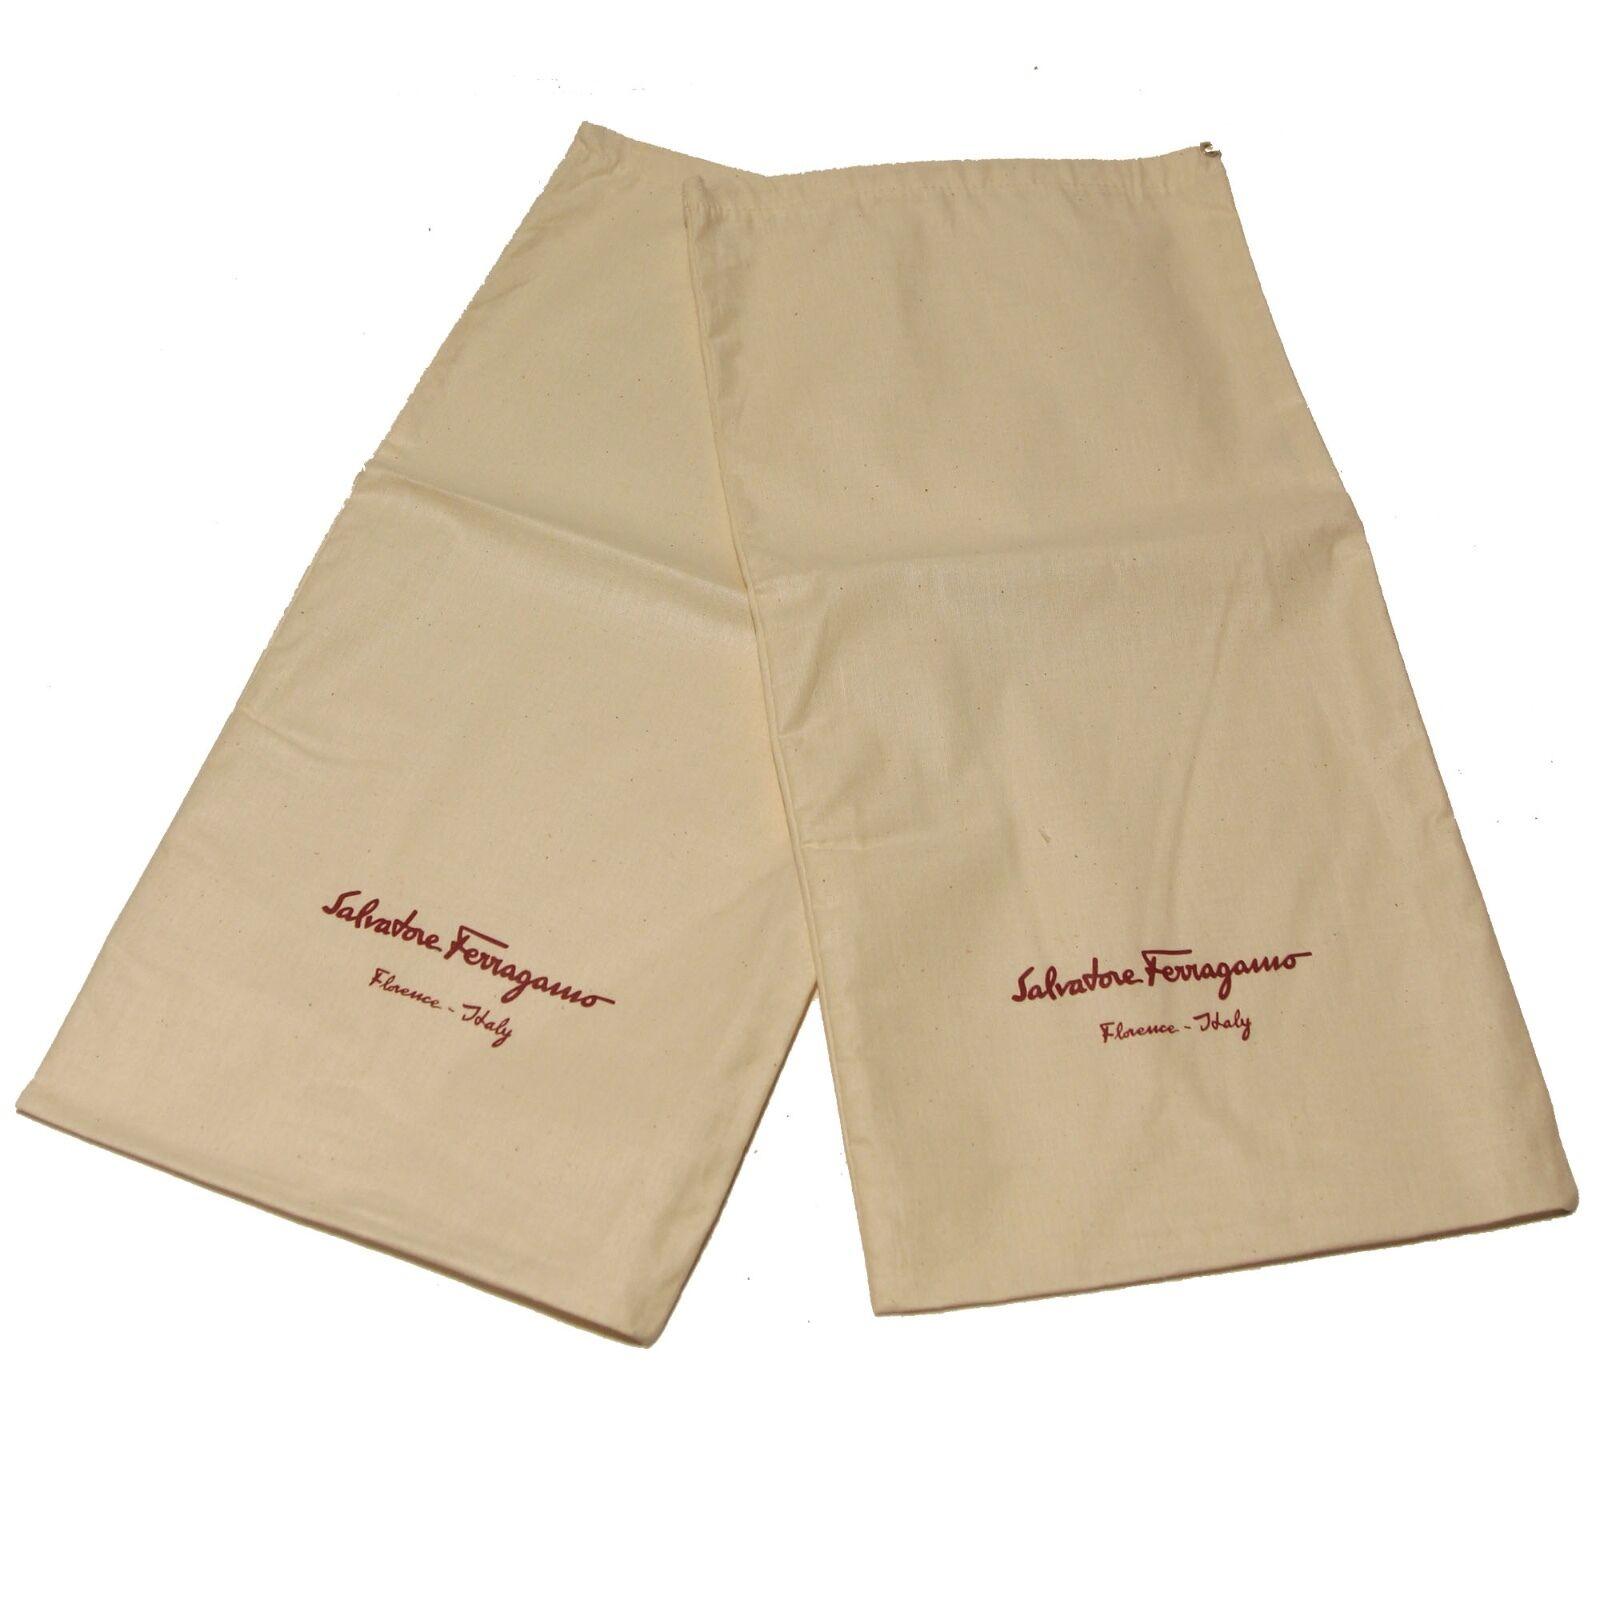 Ferragamo Brown Suede Tan Pelle Penny 13 EE Uomo Dress Casual Loafers Casual Dress Moccasin a4fcc8